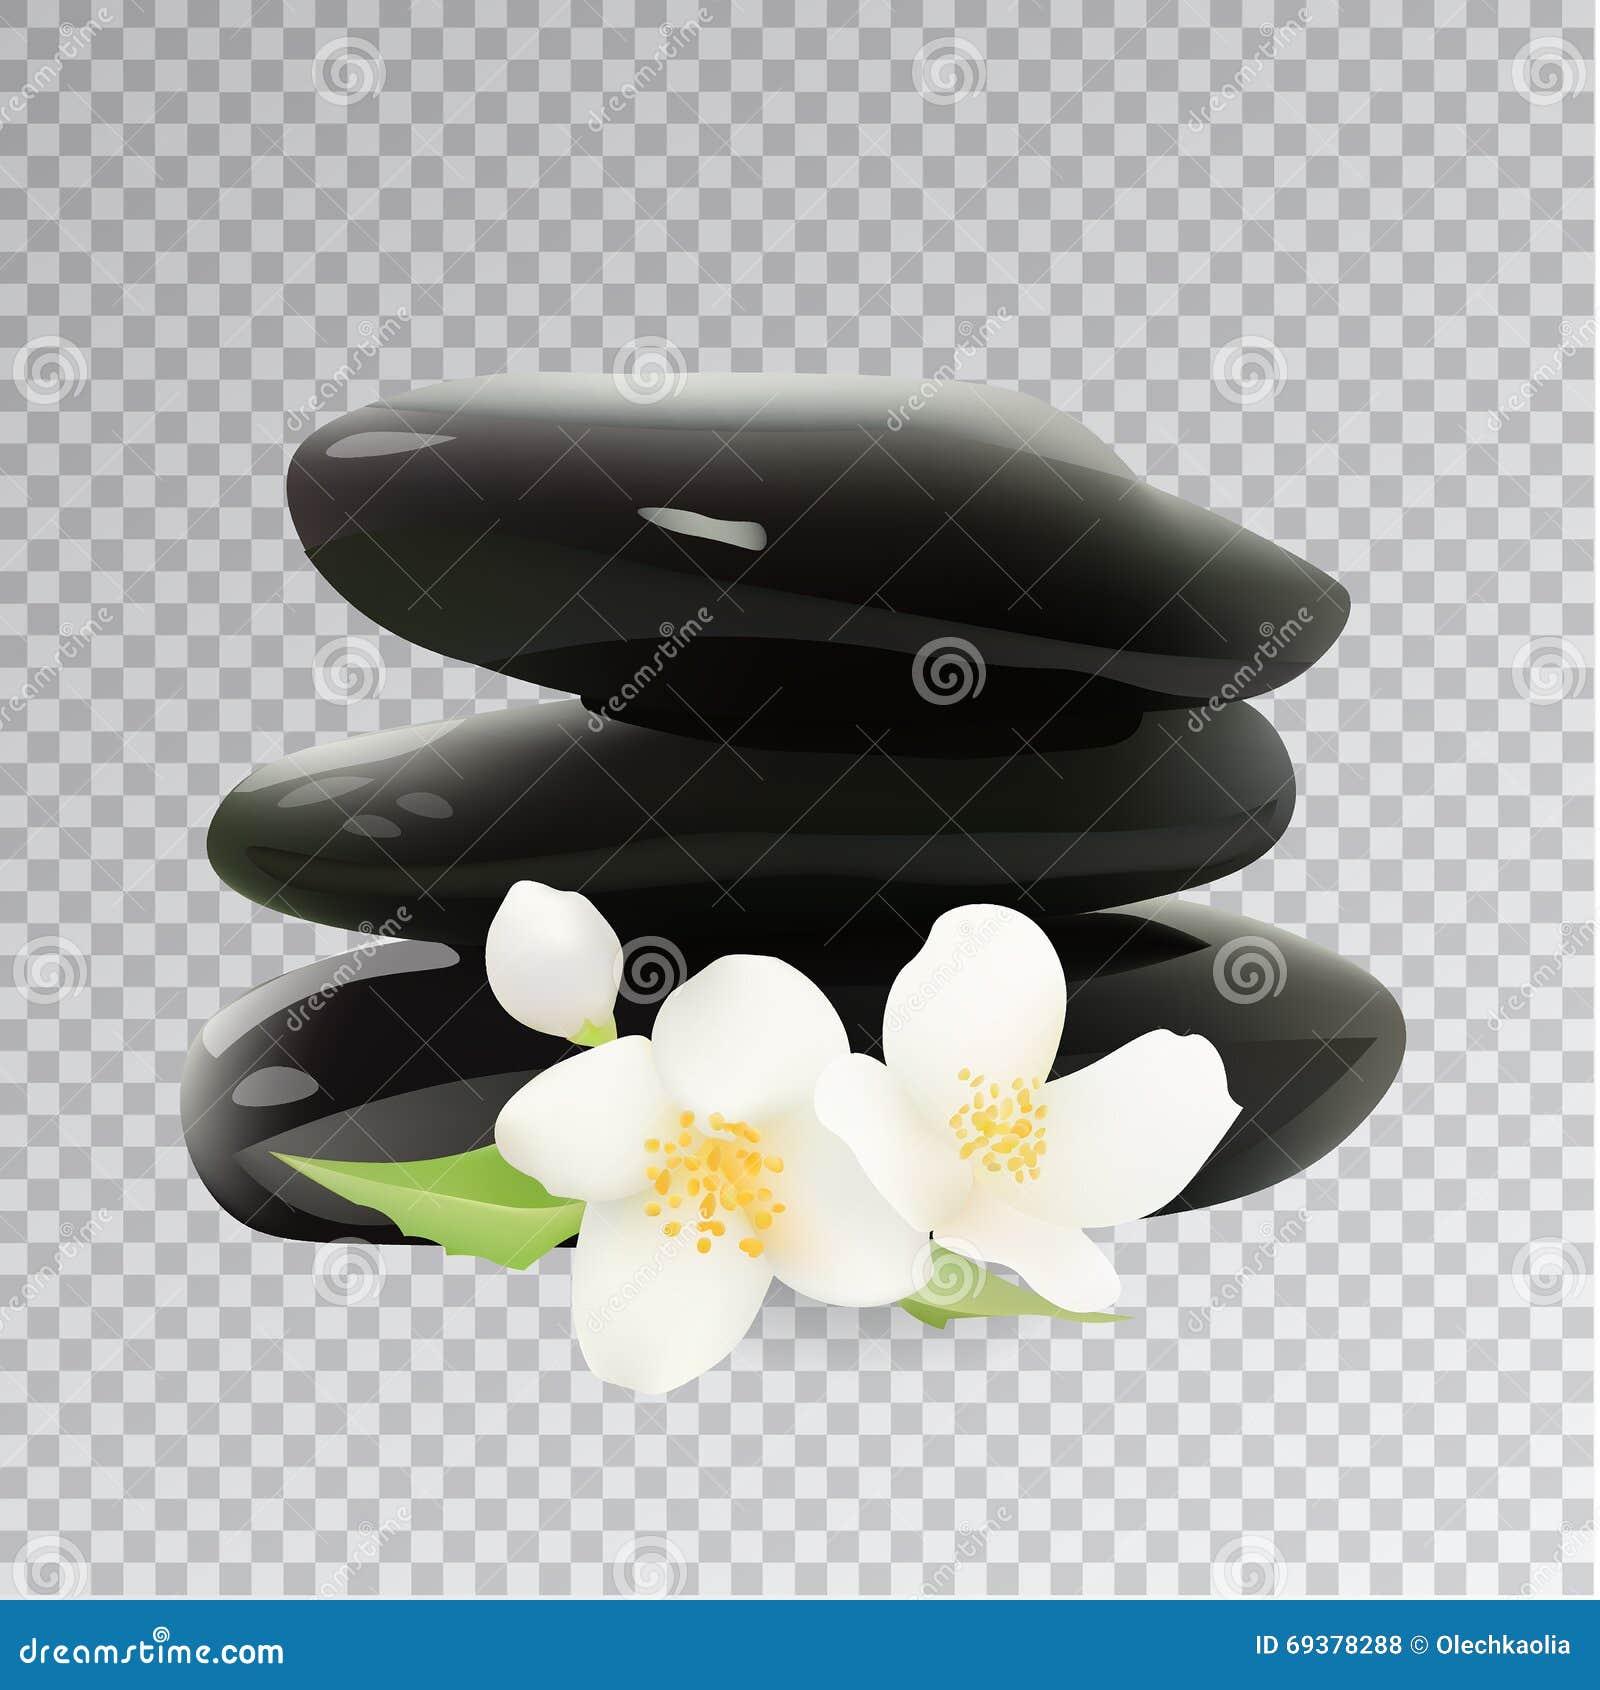 Spa Stones With Jasmine Flower Vector Illustration Template